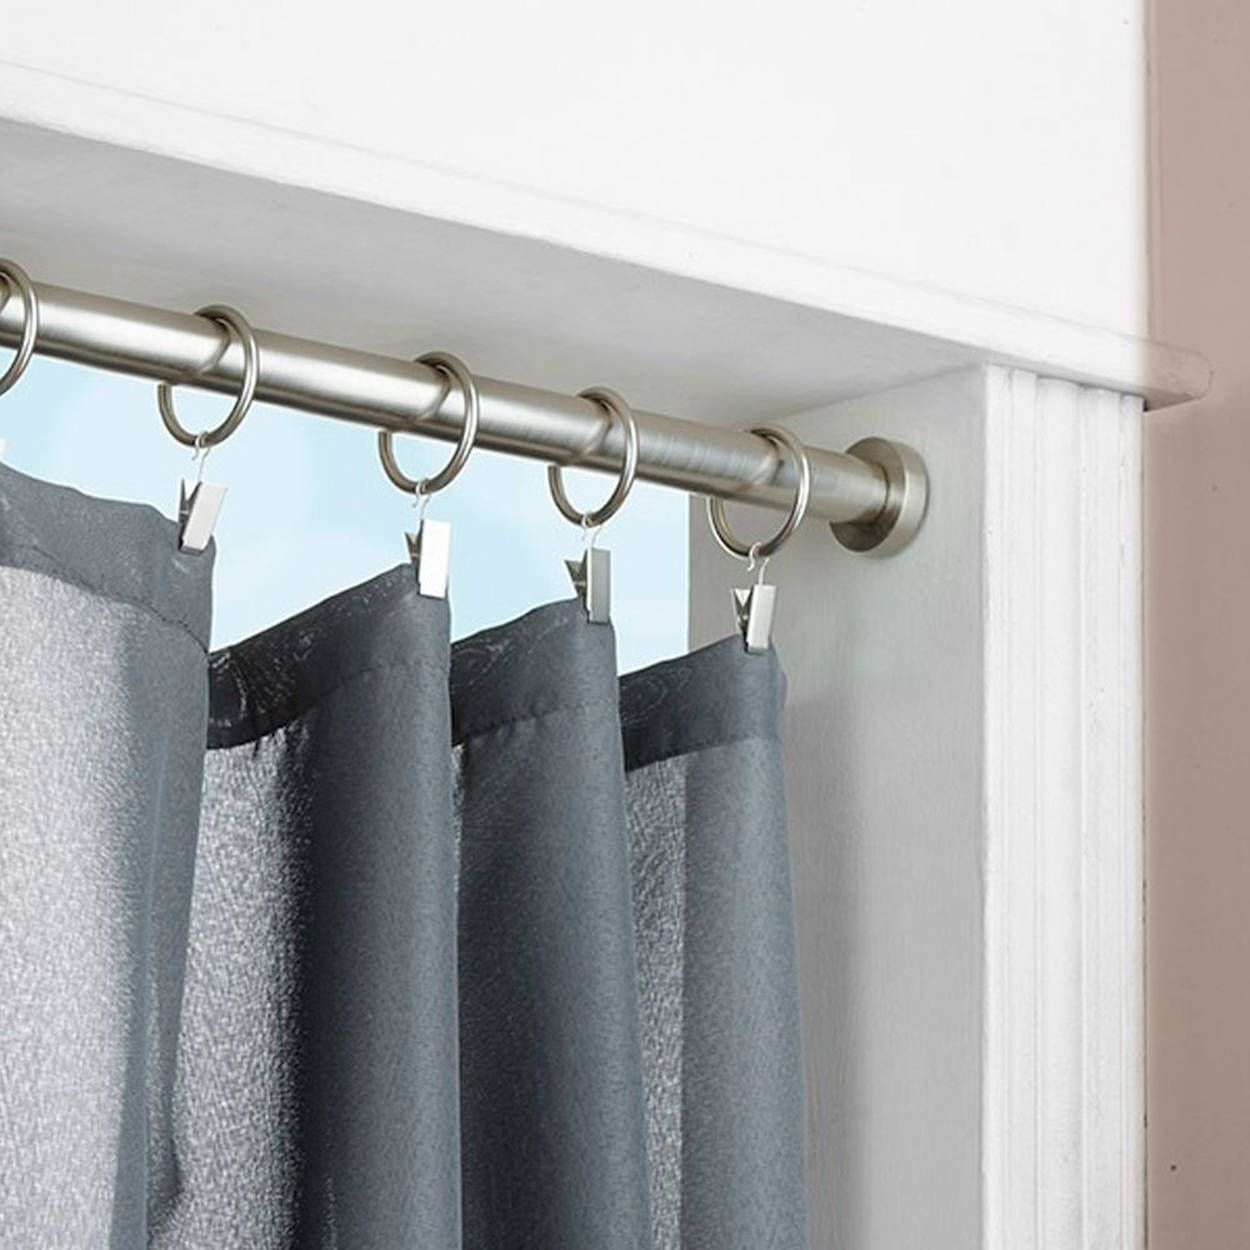 curtain tension rod diameter 16 19 mm